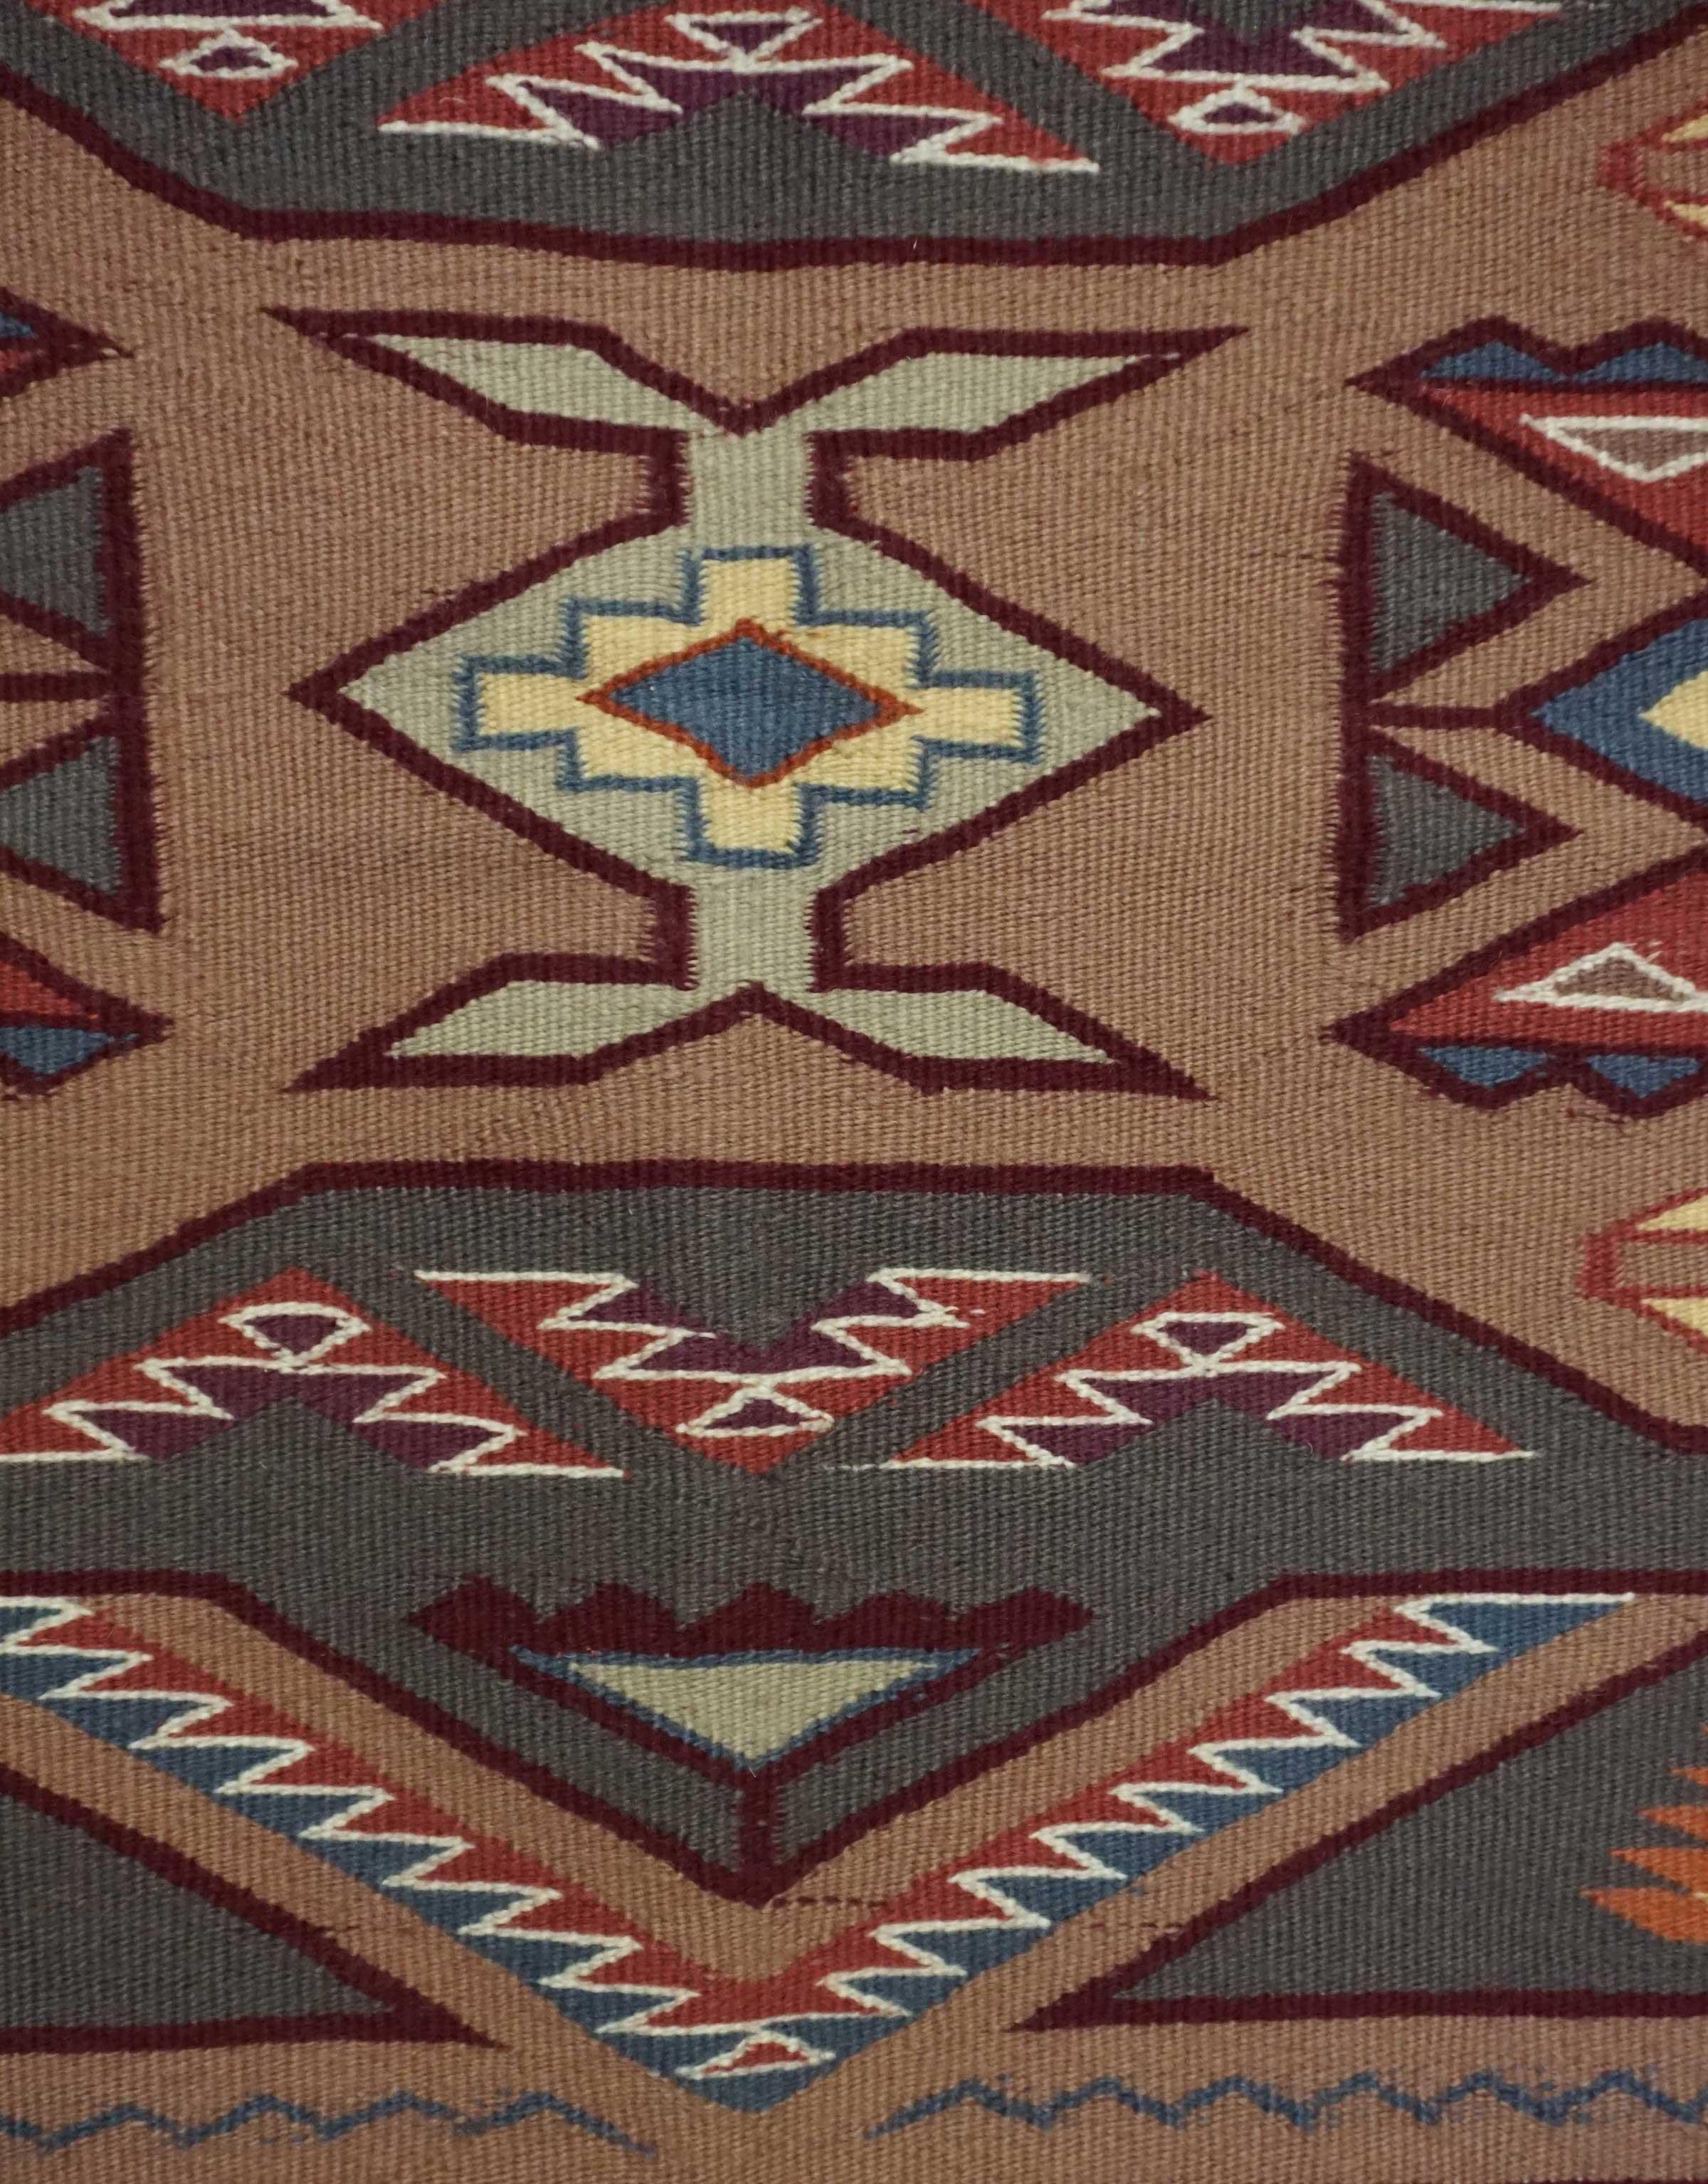 Teec Nos Pos Navajo Rug 944 Charley S Navajo Rugs For Sale